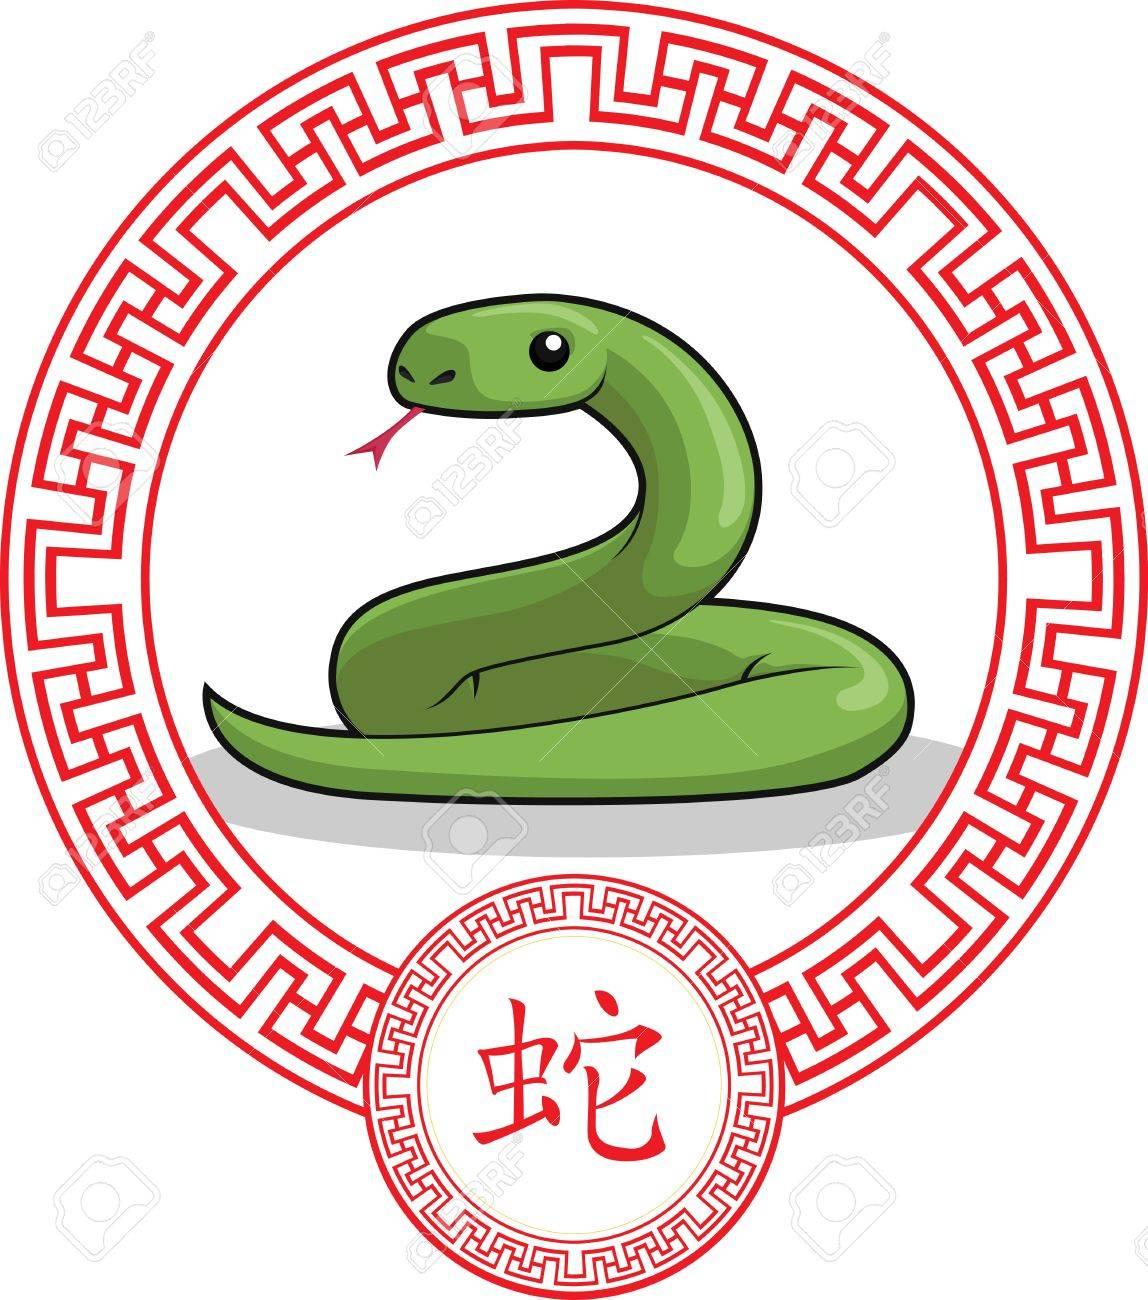 Chinese Zodiac Animal - Snake Stock Vector - 18758885